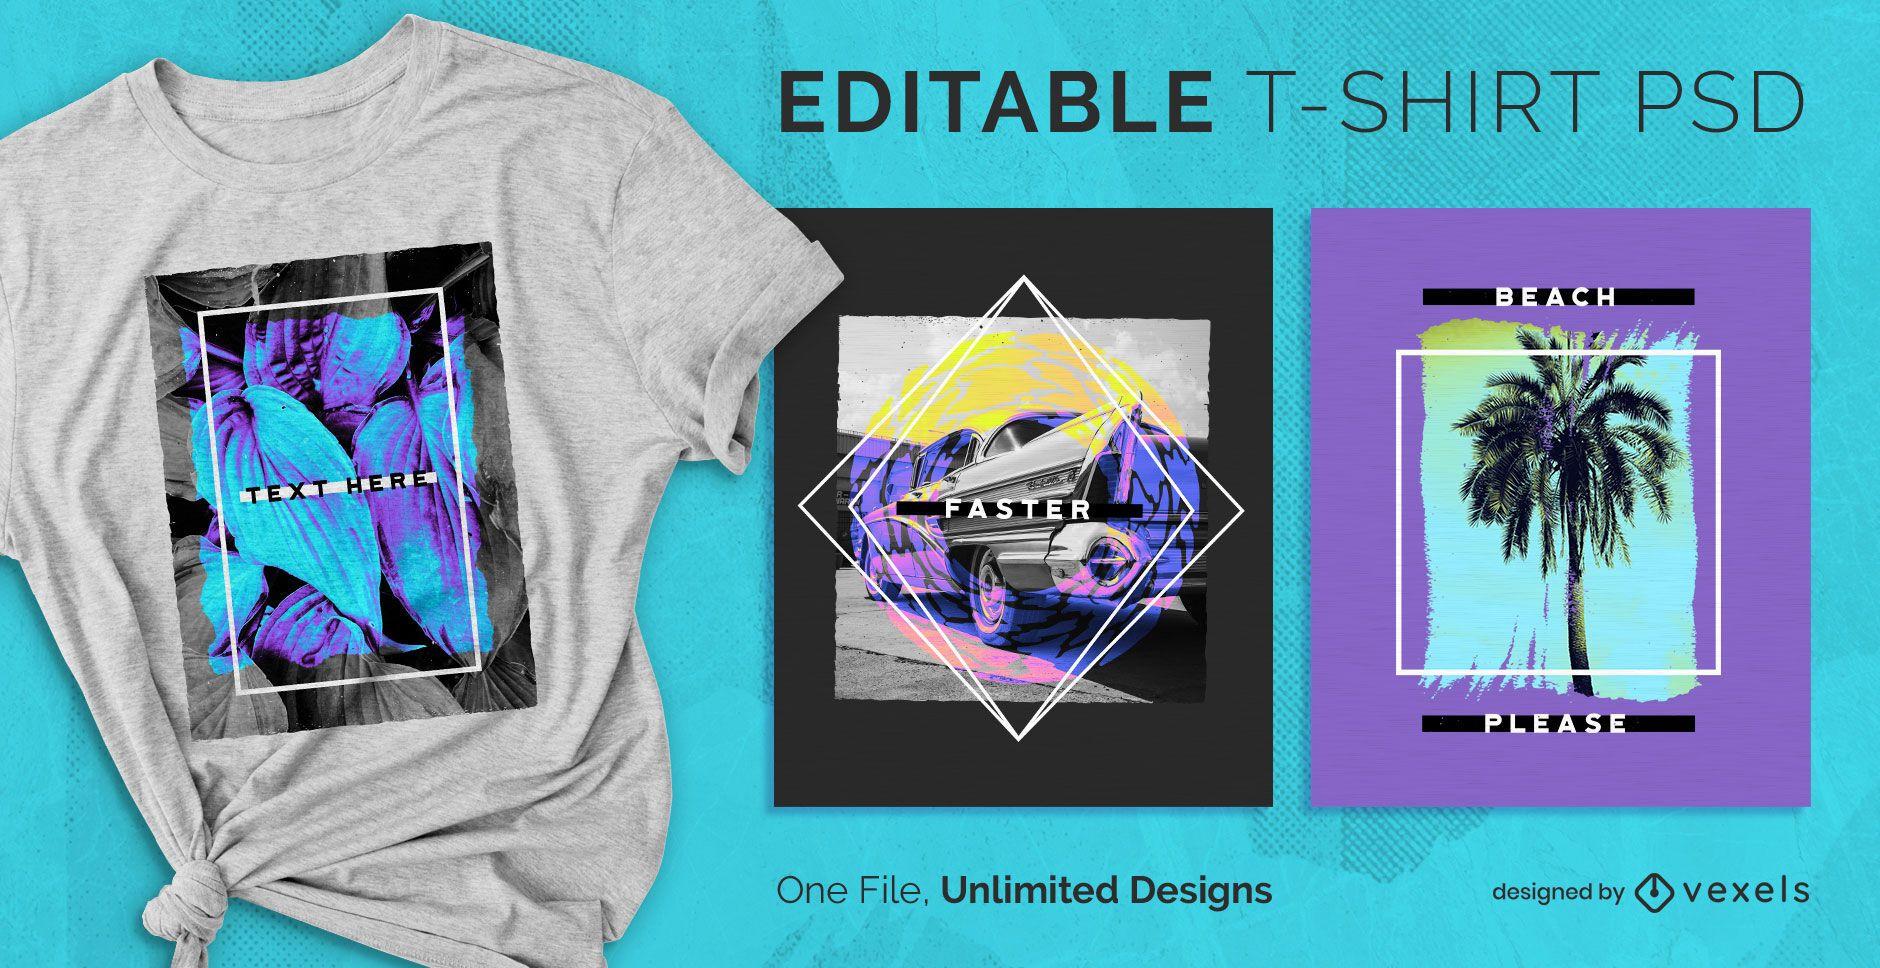 Frame scalable t-shirt psd